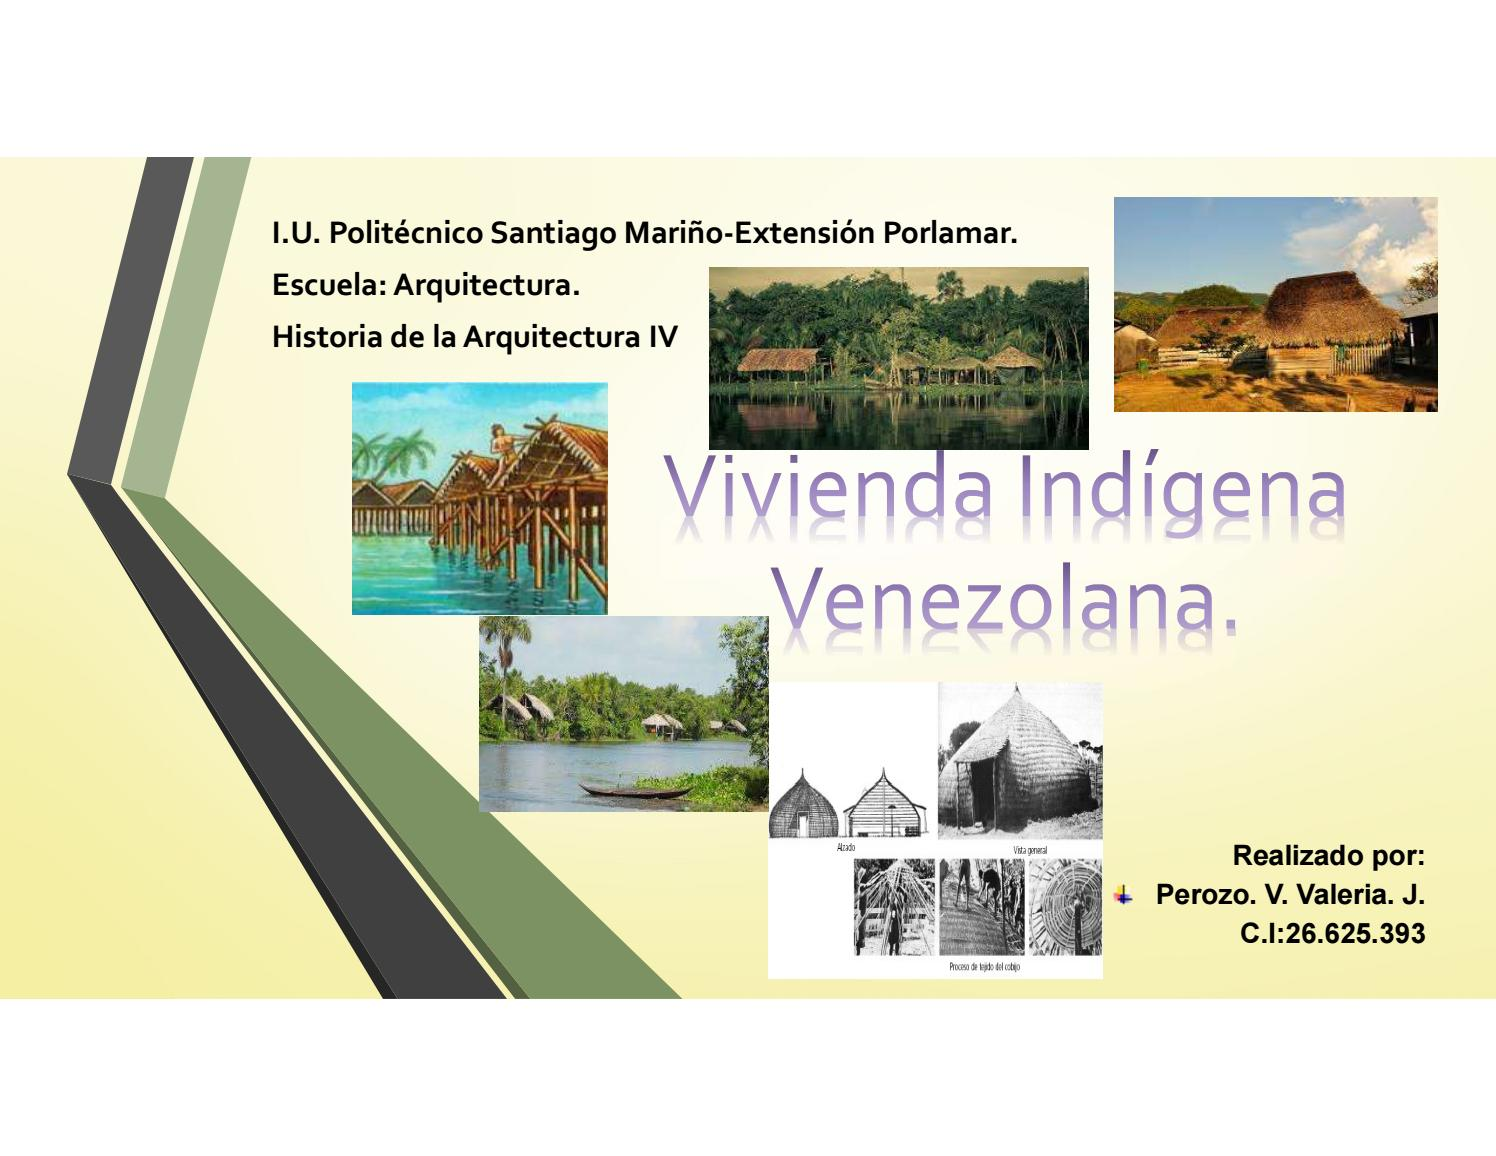 Historia vivienda idigena by valeriaperozov issuu for Informacion sobre la arquitectura